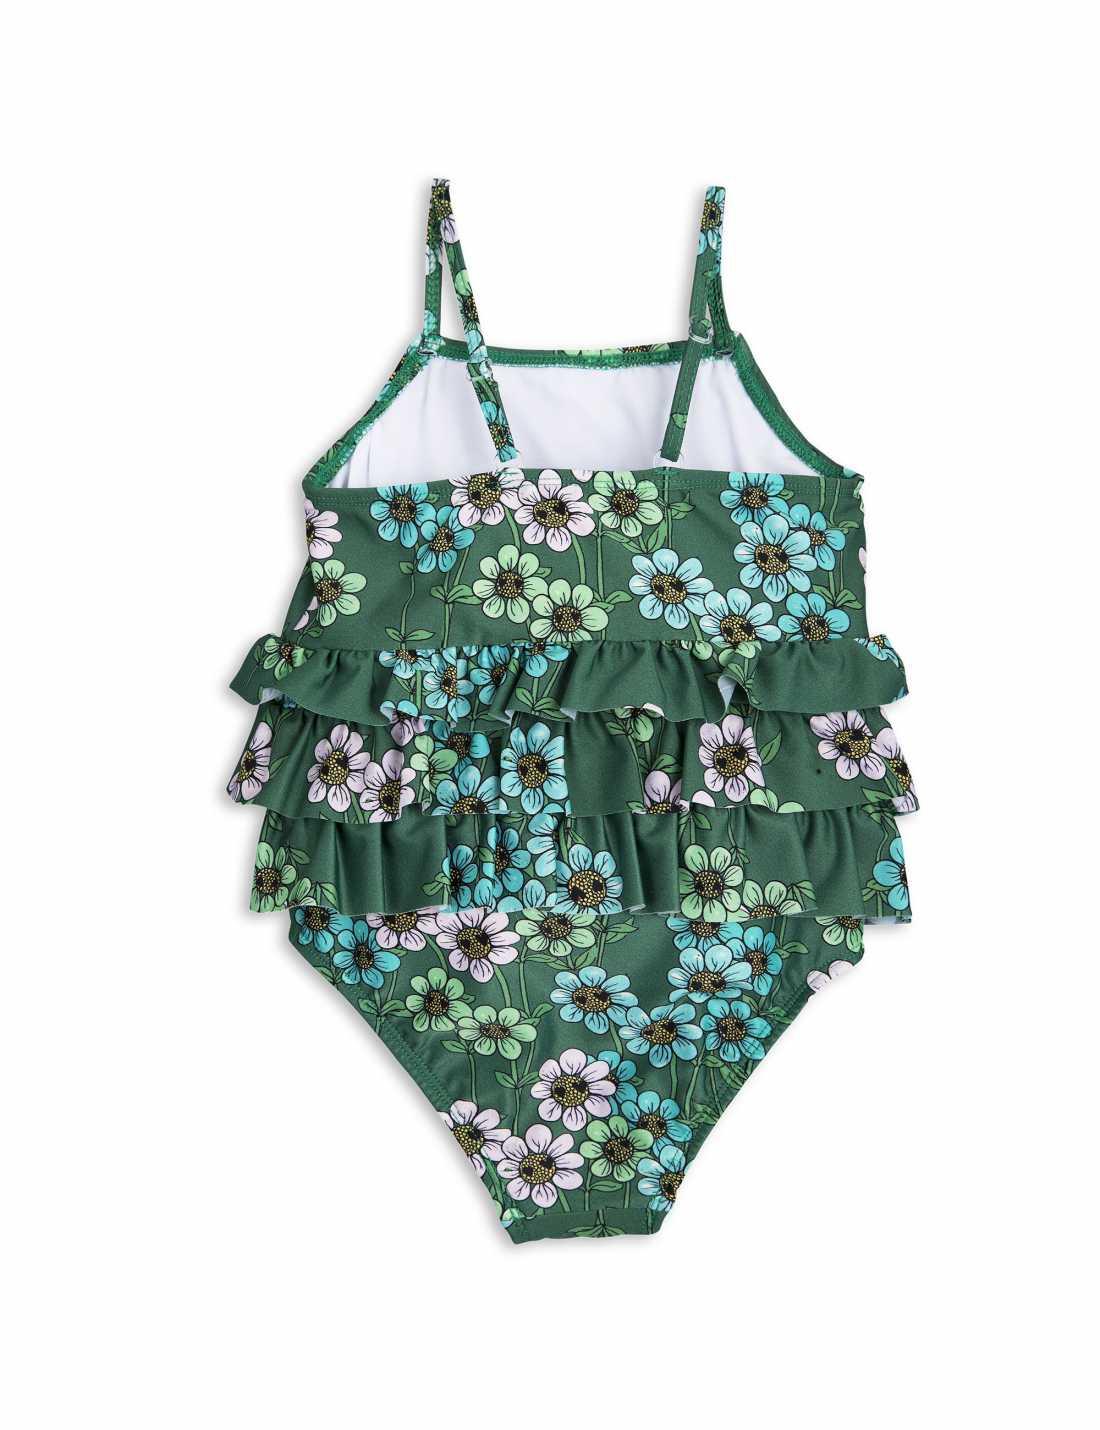 Daisy Frill Swimsuit